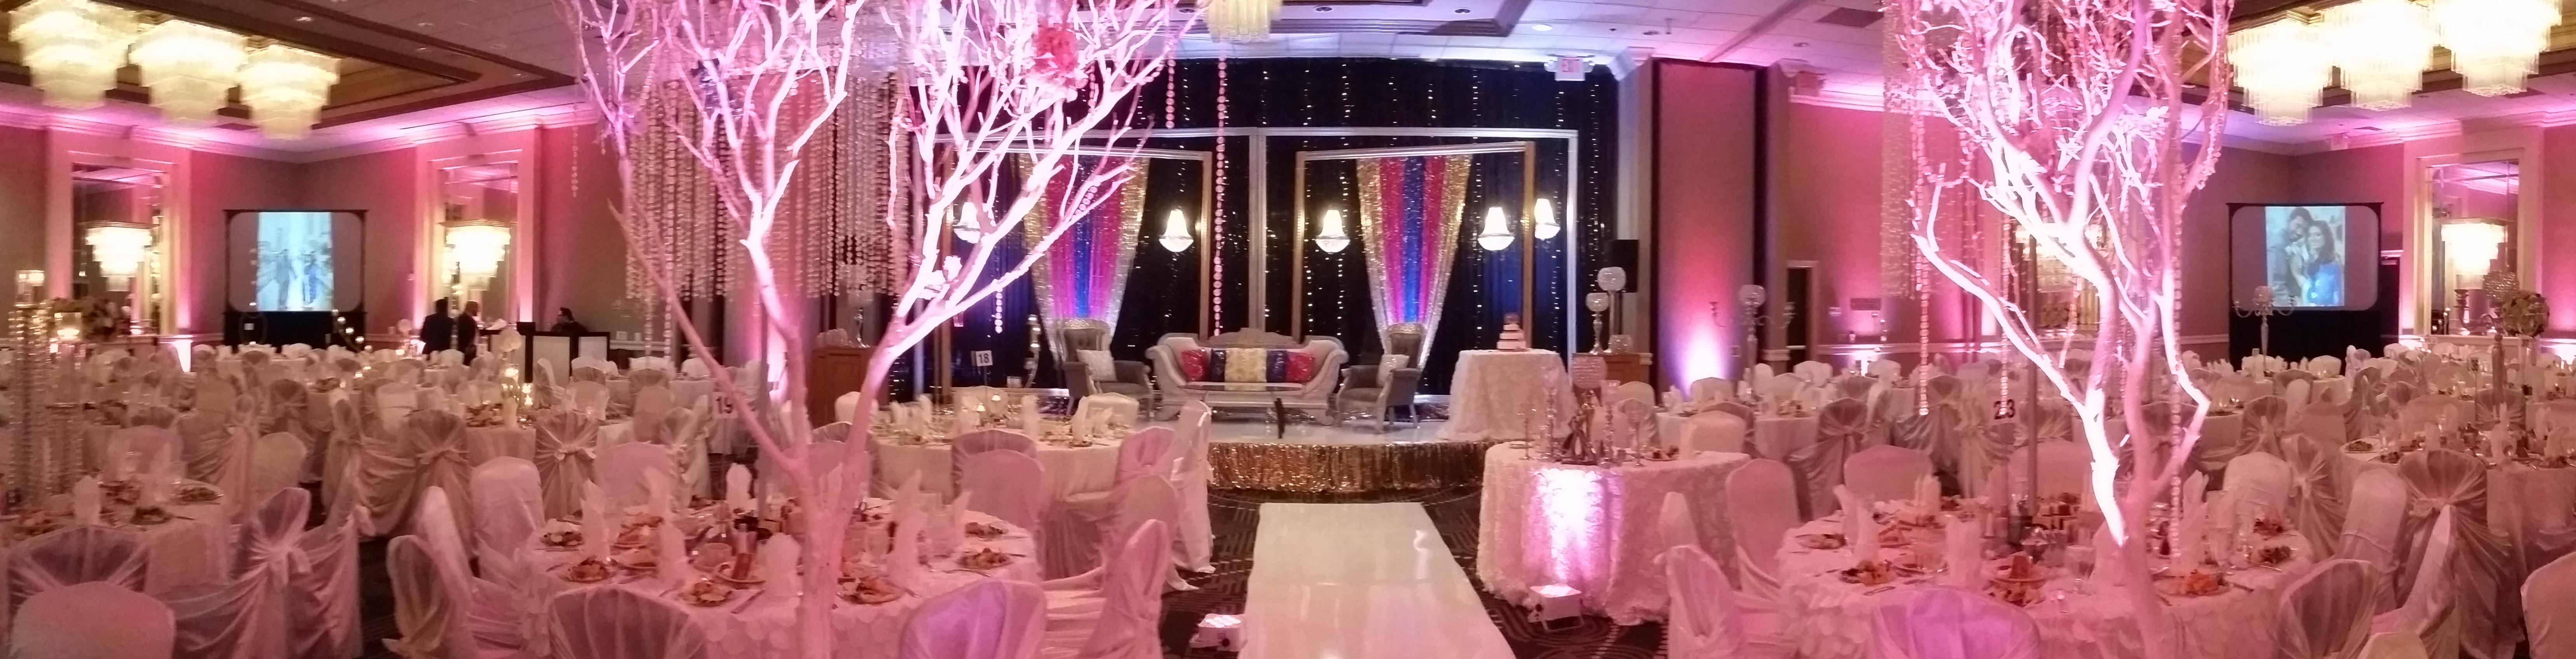 Houston Weddings, Weddings in Houston, Big Screen Rear Projection for Houston Audio Visual, Houston A/V, Up-Lighting, Houston Indian Wedding, Awesome Music Entertainment, Awesome Event Pros, Awesome Lighting Decor, AME DJs, Sonido DJ Sammy de Houston